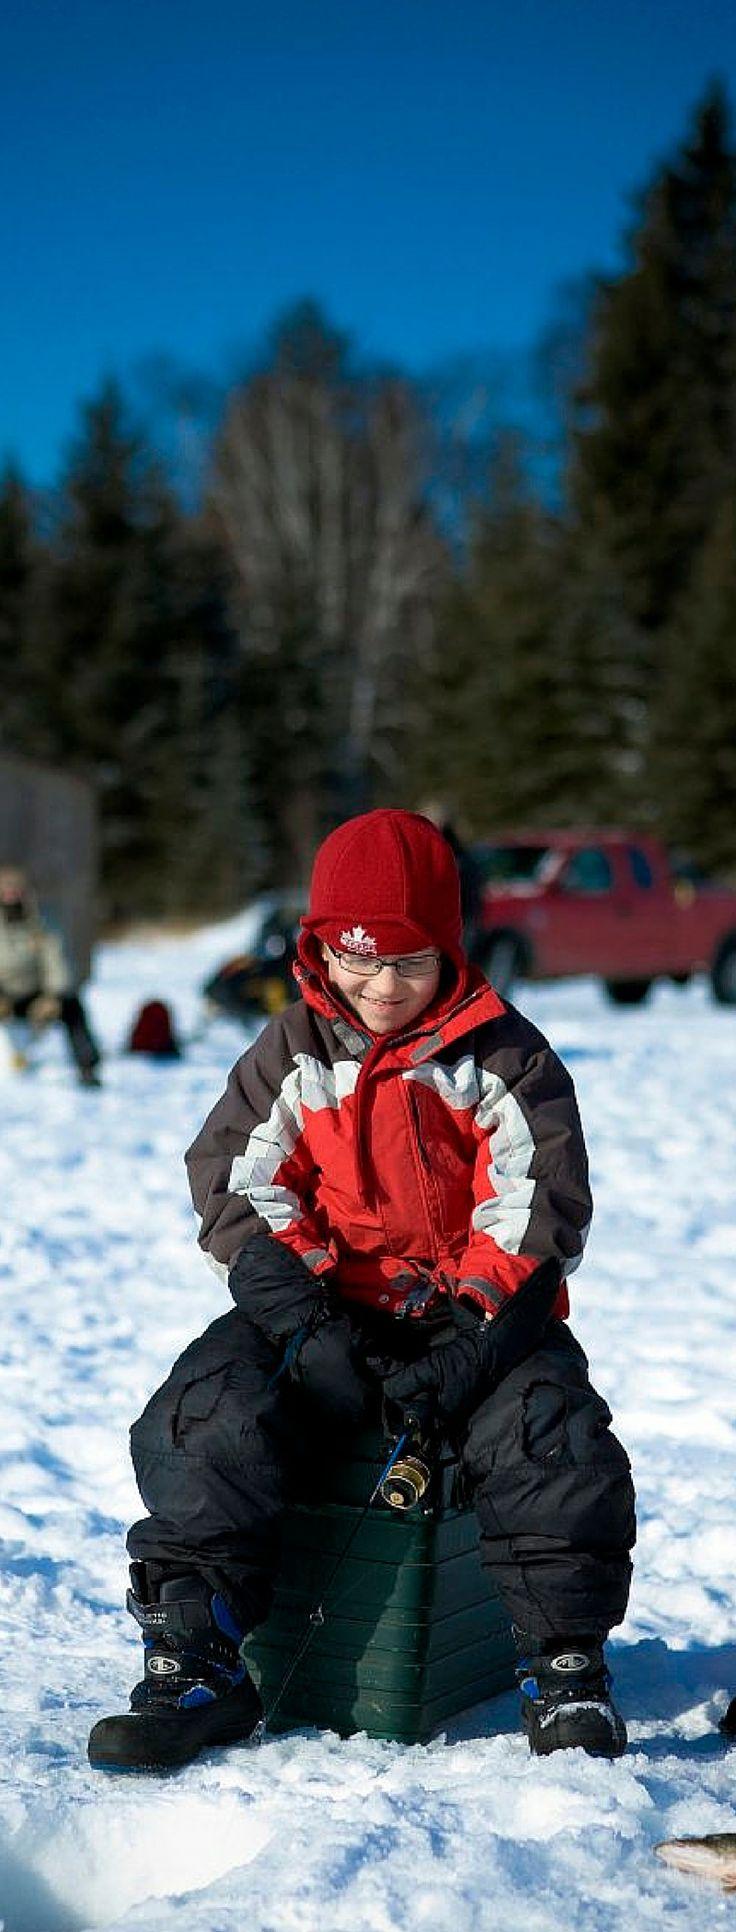 Fish for dinner. Snowcation in Canada.  Photo: Tourism Saskatchewan/Greg Huszar Photography